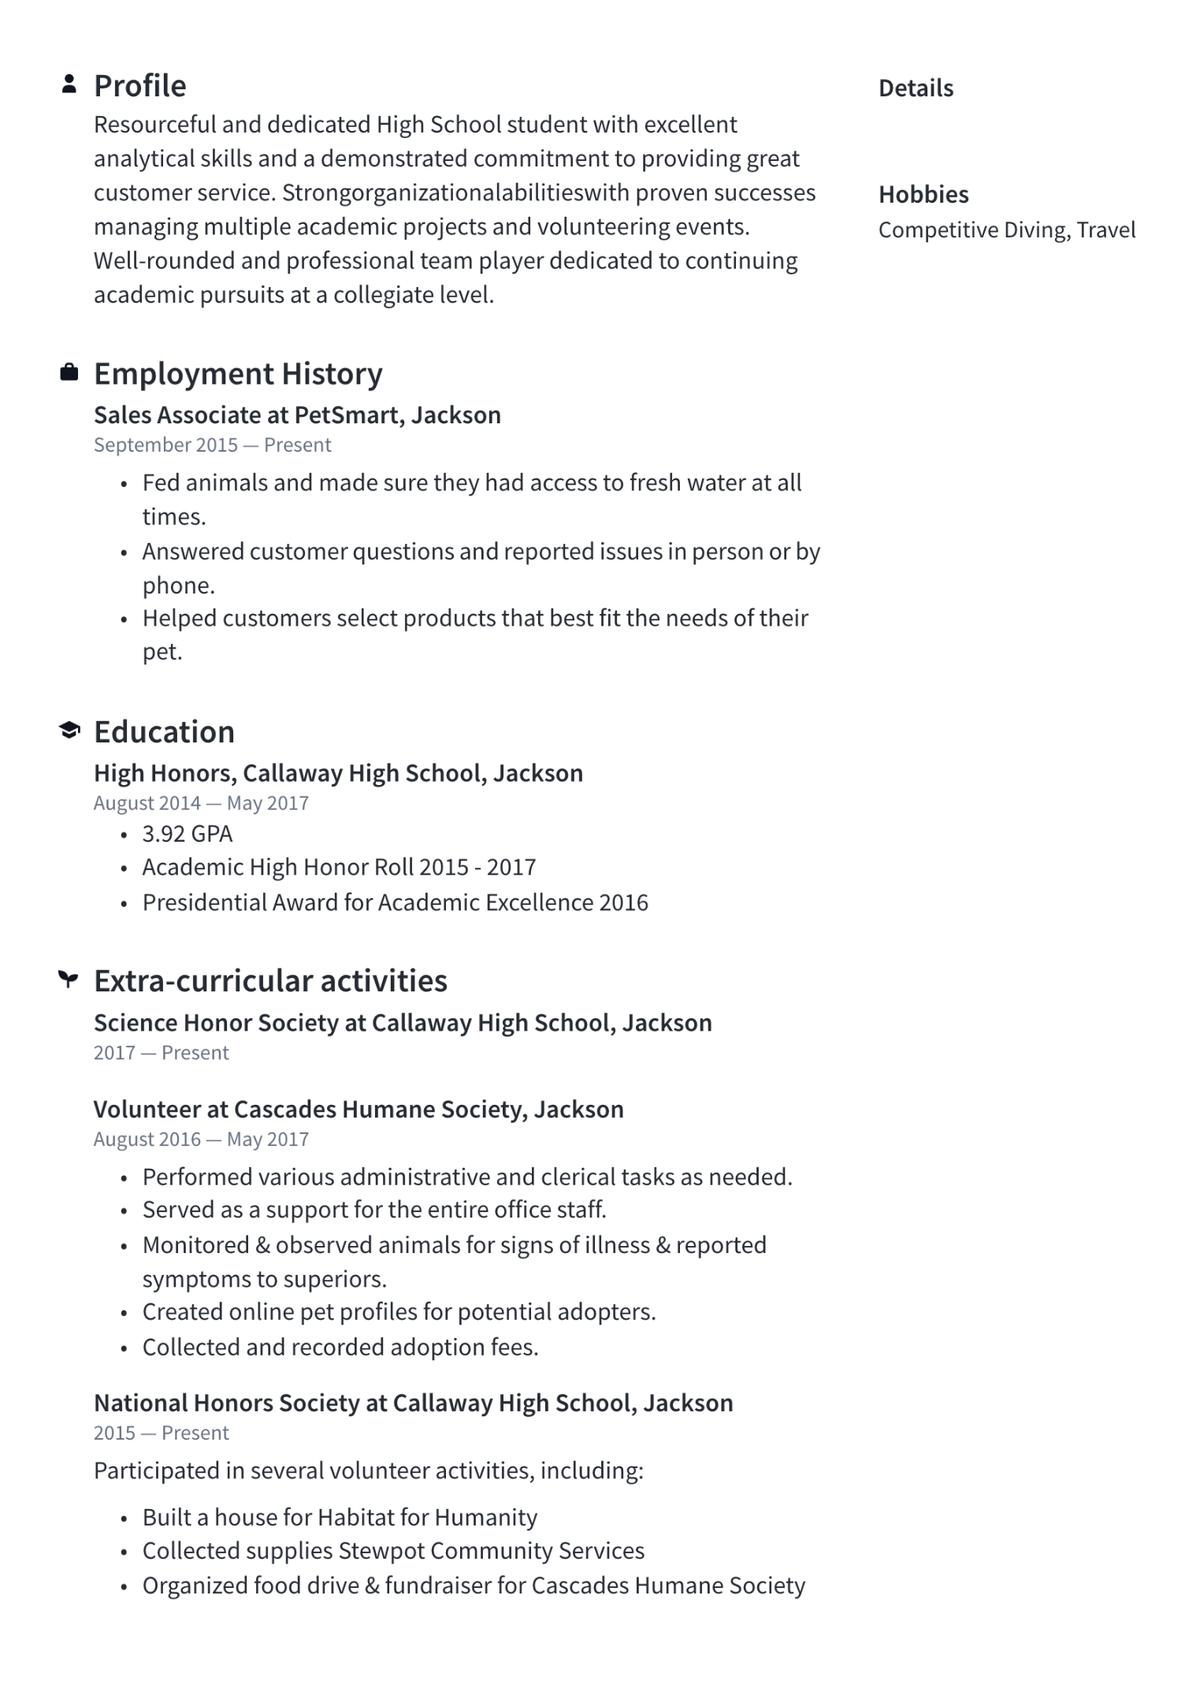 Пример резюме выпускника школы. Источник: Resume.io